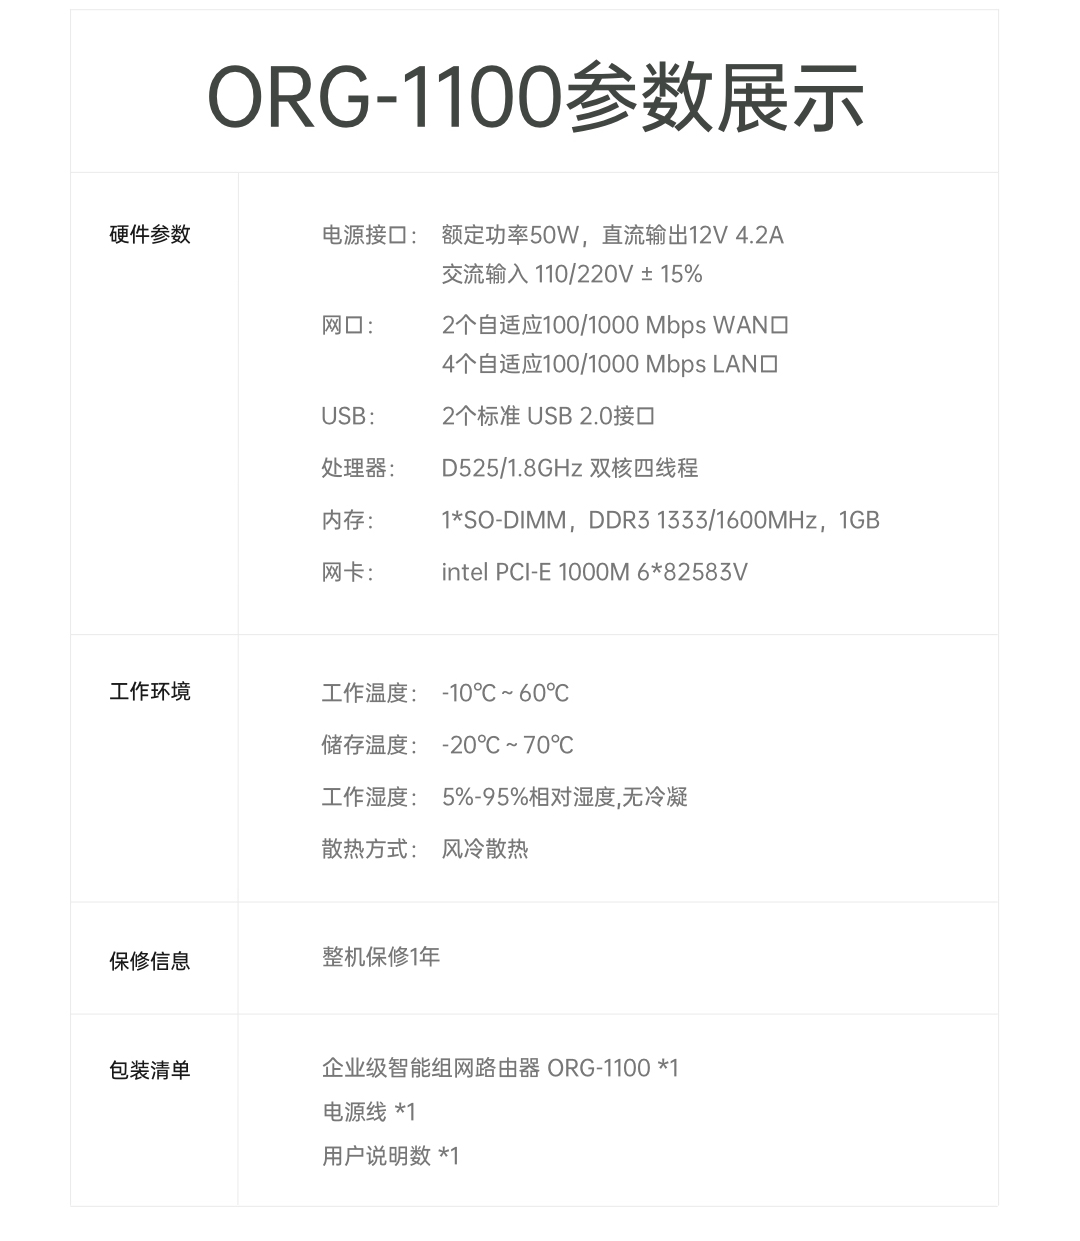 ORG-1100_09.jpg